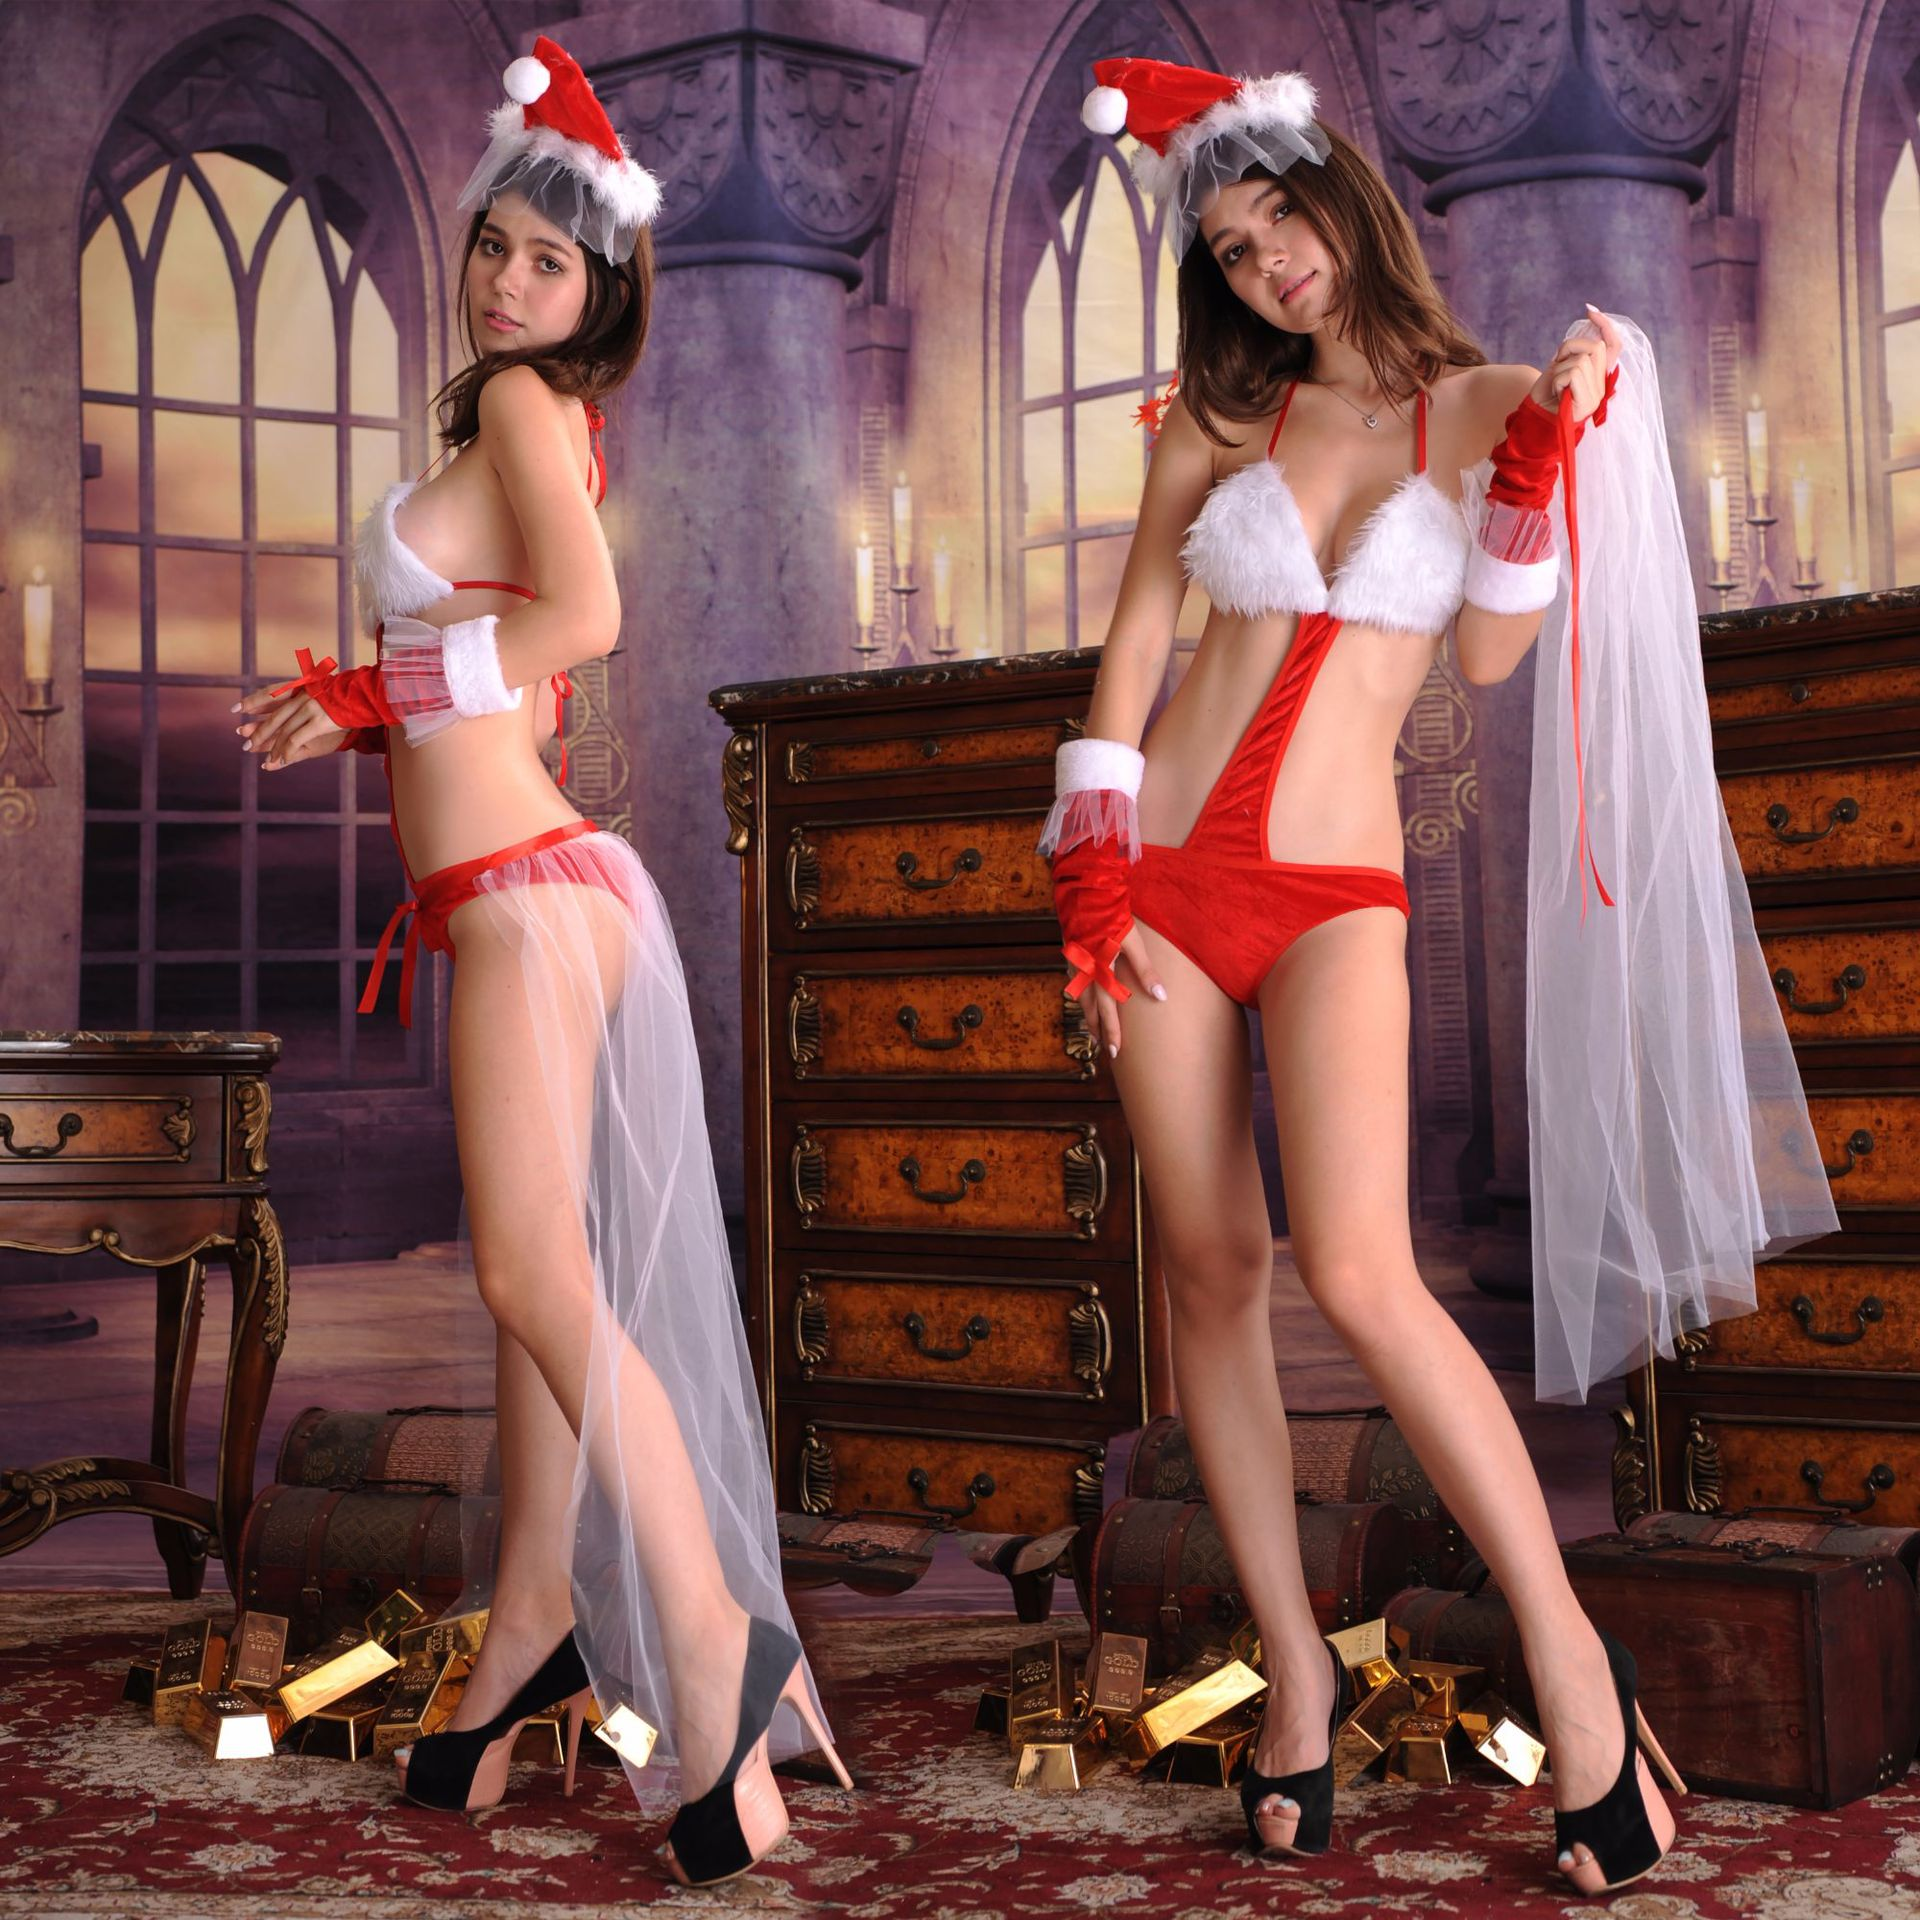 Diplomatisch Sexy Vrouwen Stadium Rollenspel Drie Punt Bikini Siamese Kerst Jurk Sexy Kostuum Cosplay Kerst Lingerie Pak Goedkope Verkoop